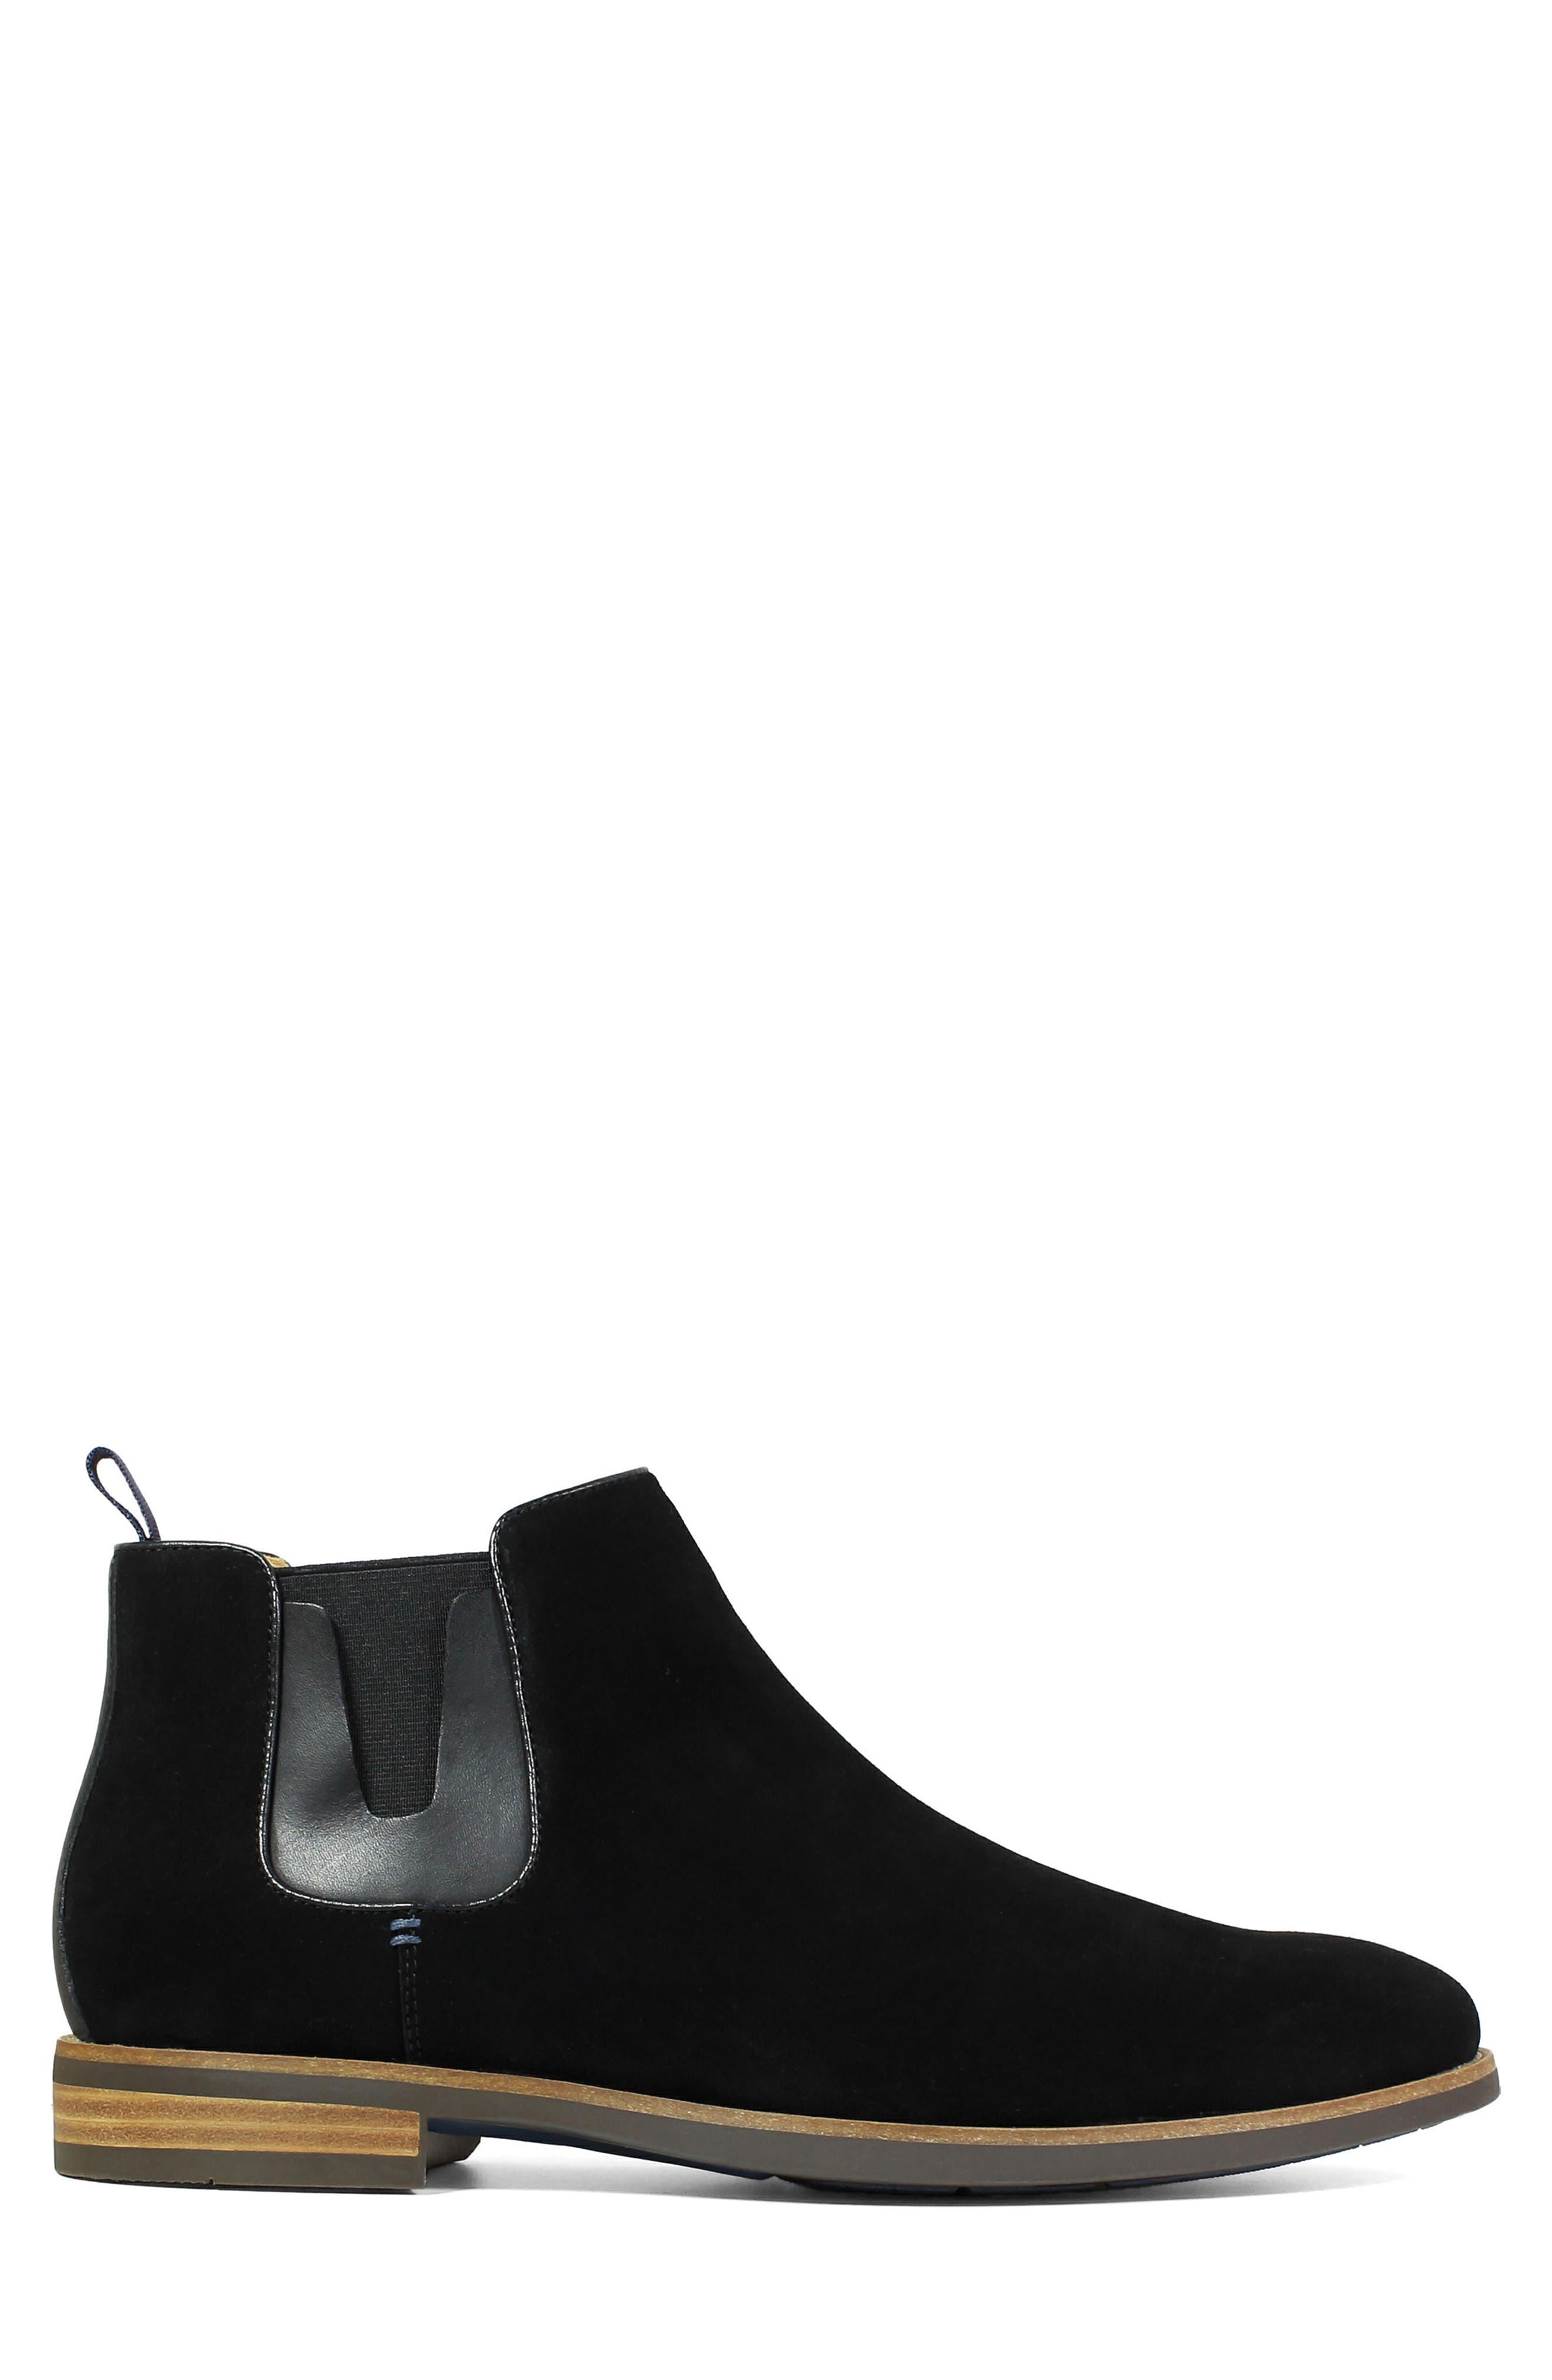 Uptown Plain Toe Mid Chelsea Boot,                             Alternate thumbnail 3, color,                             BLACK SUEDE